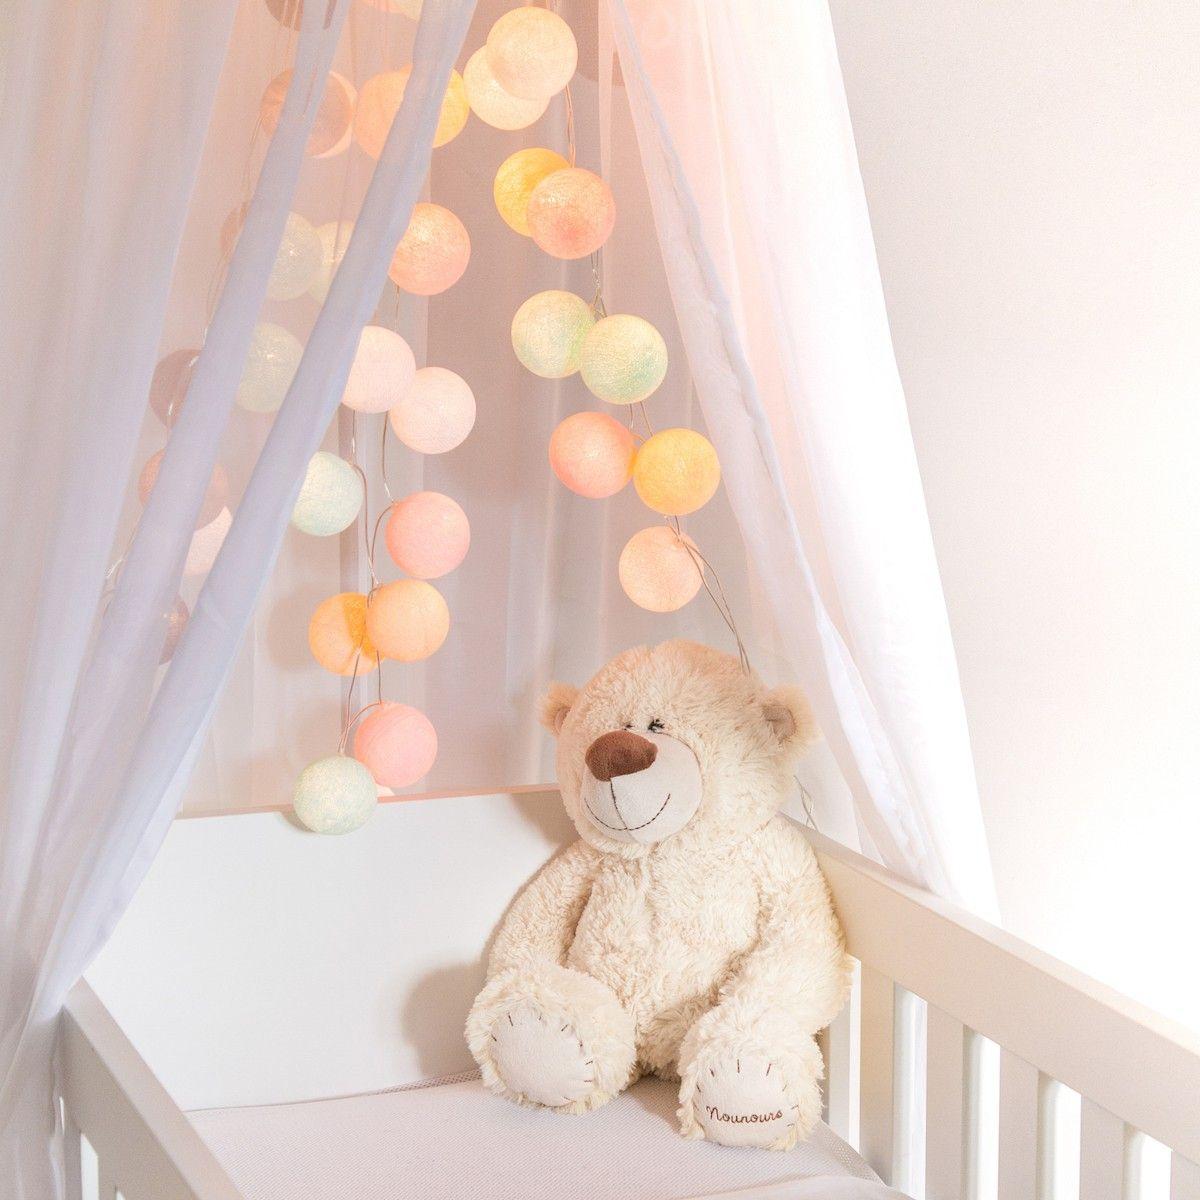 Guirlande Lumineuse Cotton Ball Lights Pastel Pour Illuminer Votre Chambre De La Plus Belle Des Facons Gui Disenador De Interiores Disenos De Unas Guirnaldas